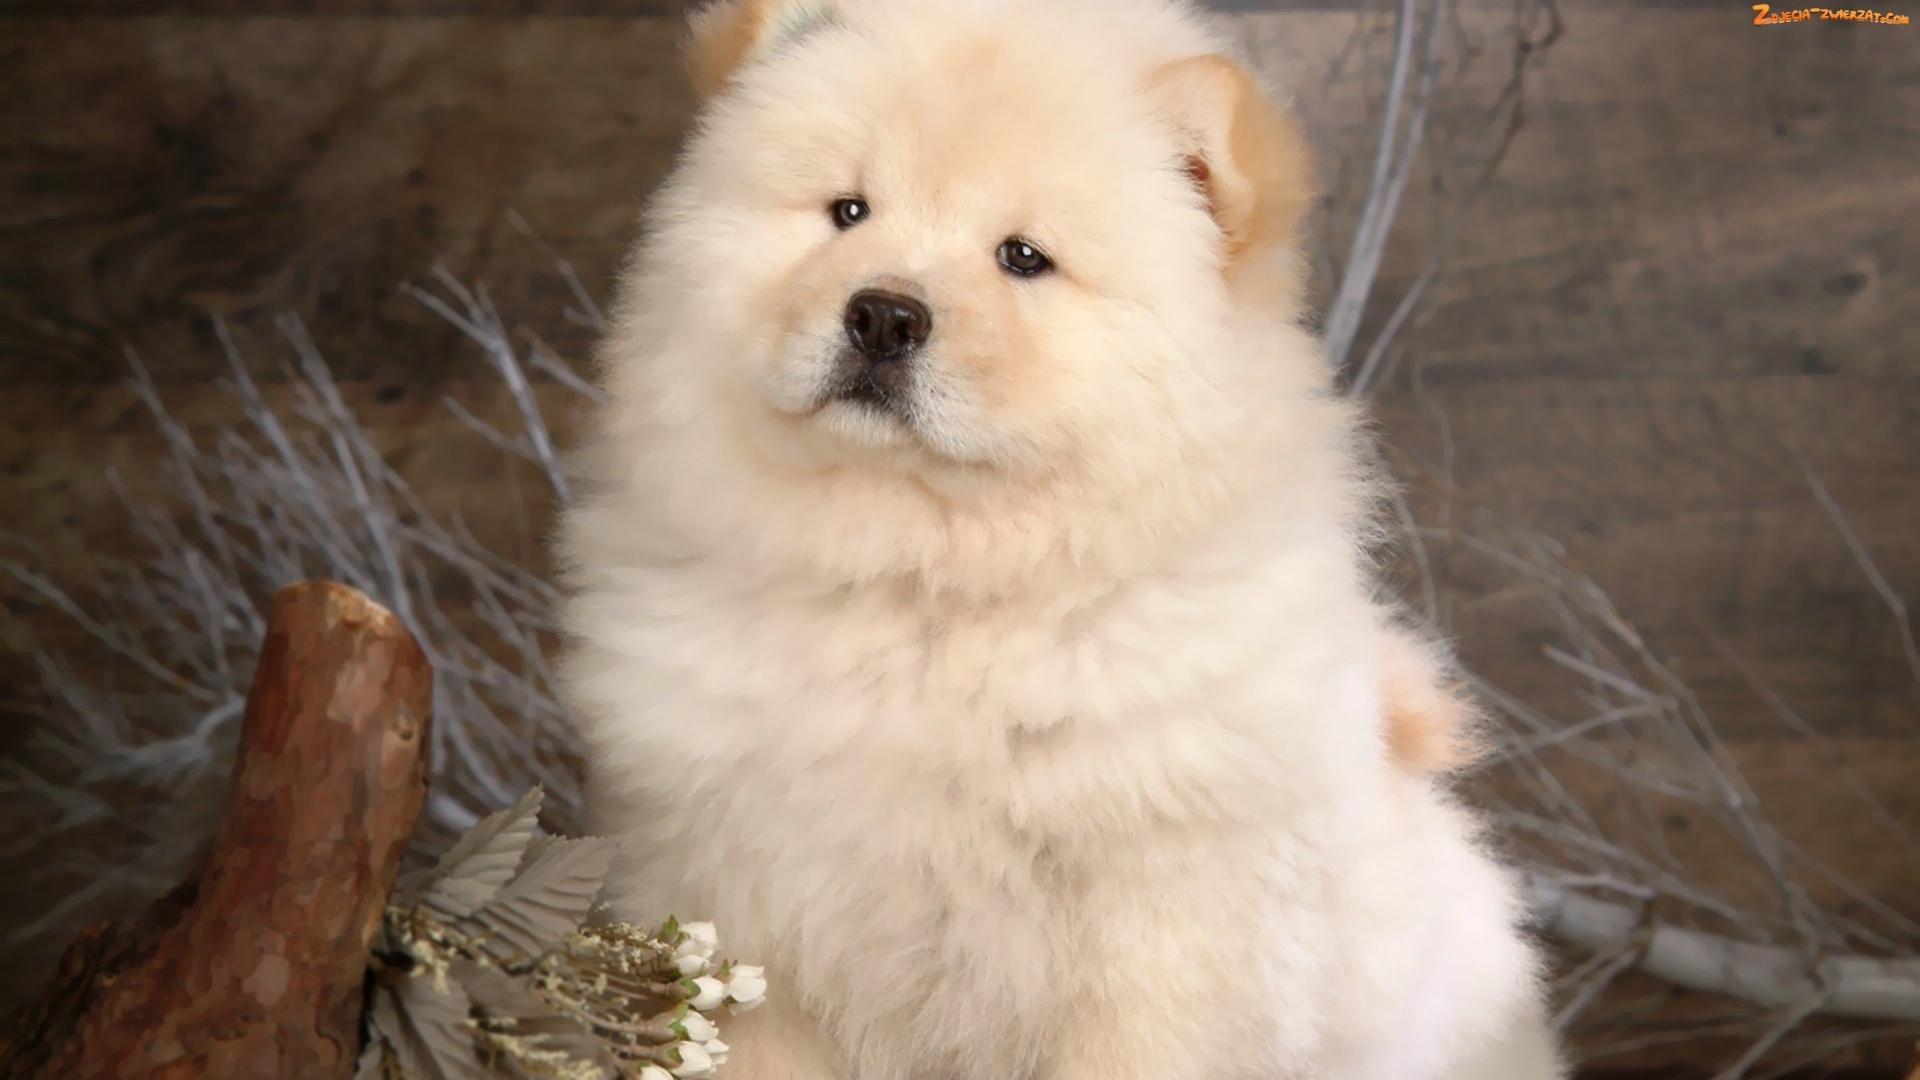 tapete zoo hund teddy - photo #13